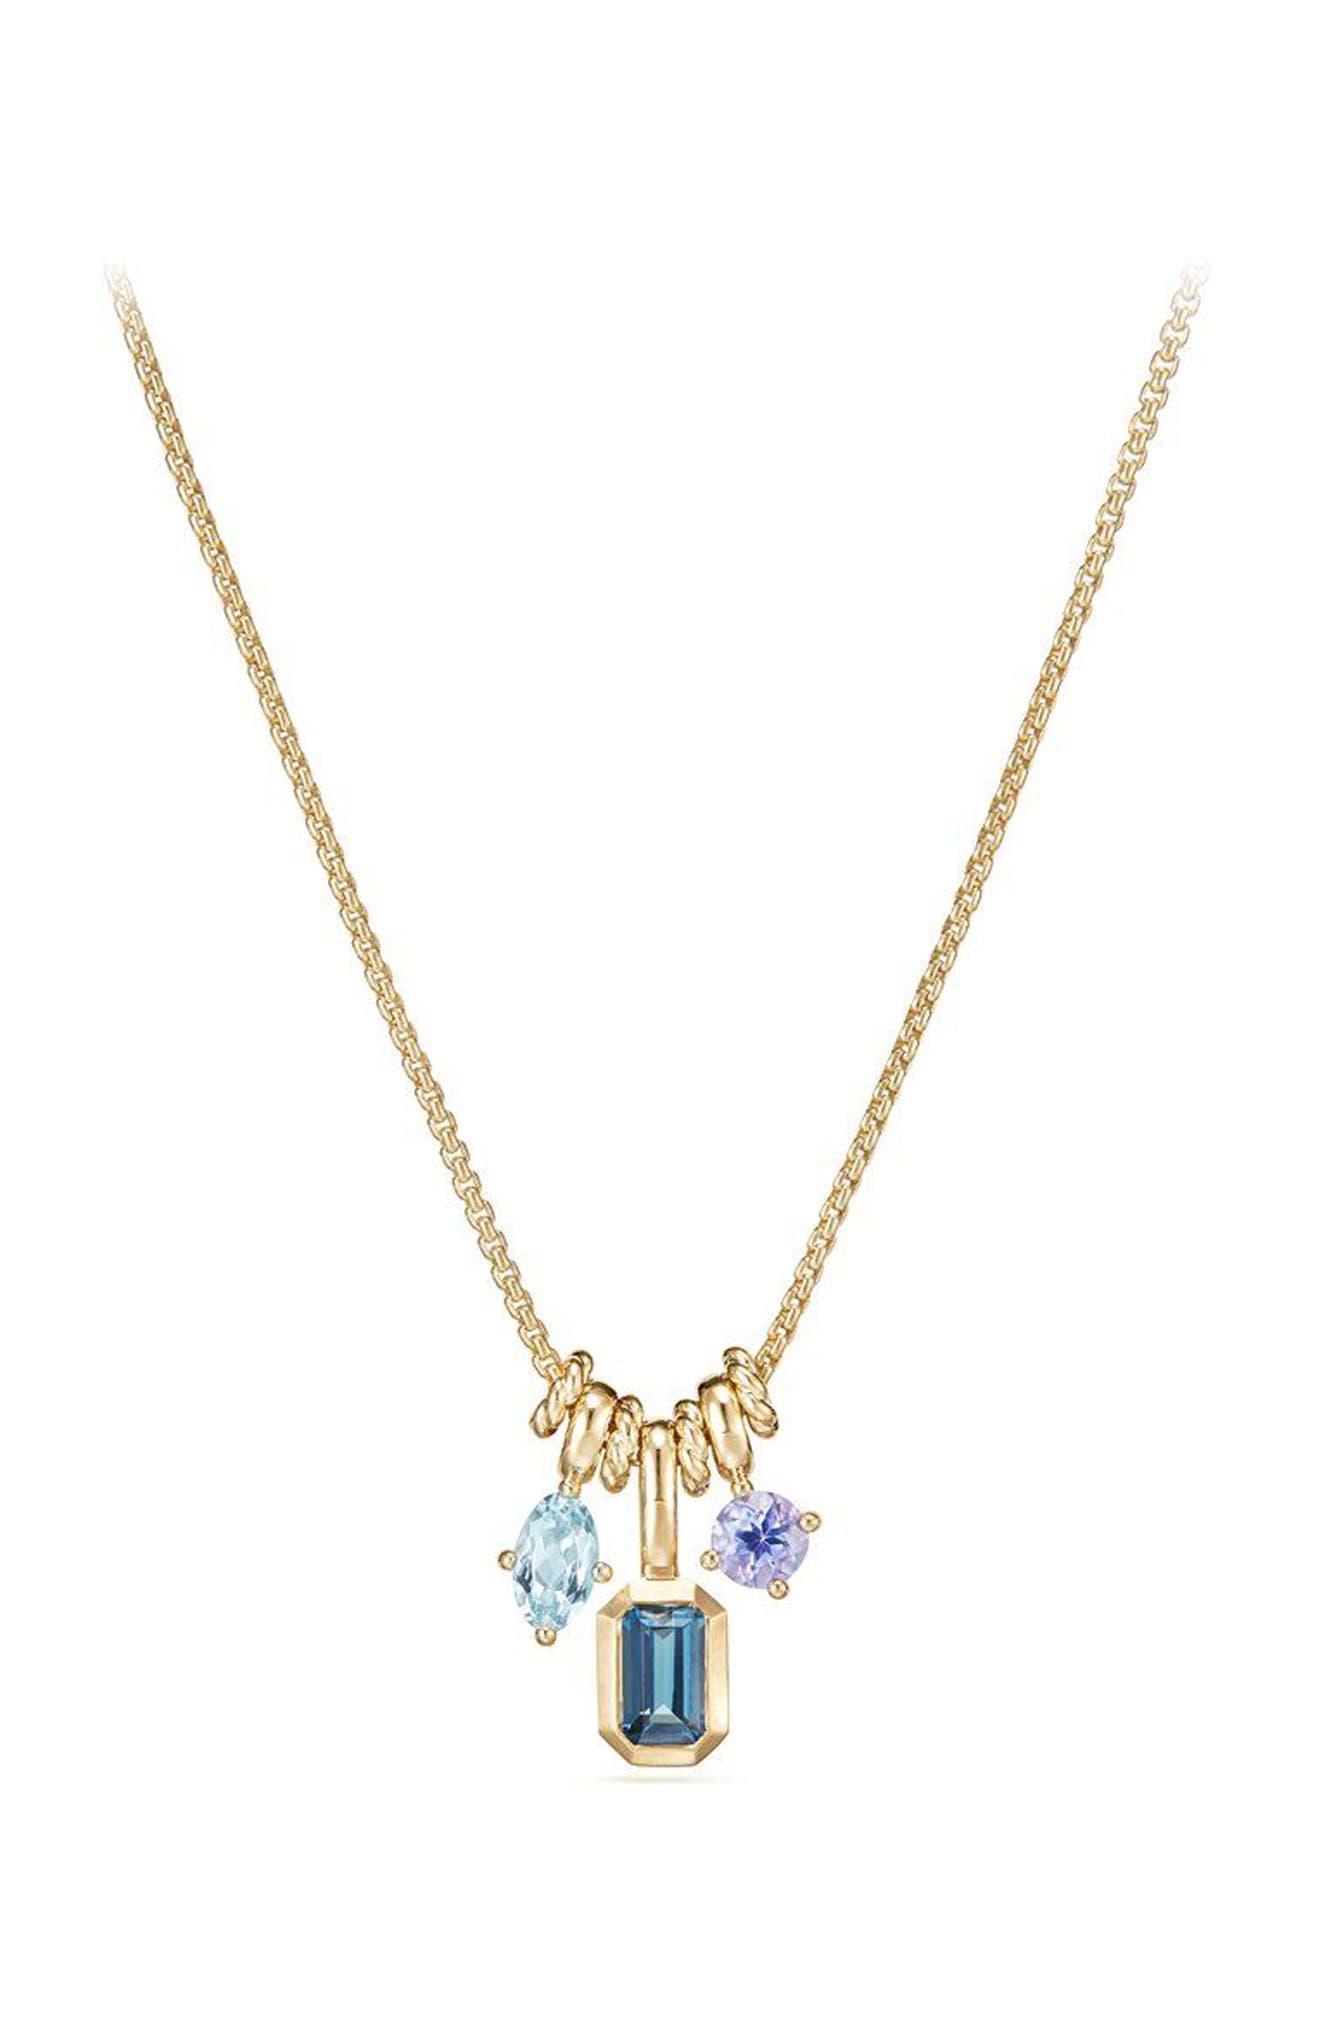 Novella Pendant Necklace in 18K Gold,                         Main,                         color, GOLD/ BLUE TOPAZ/ AQUAMARINE